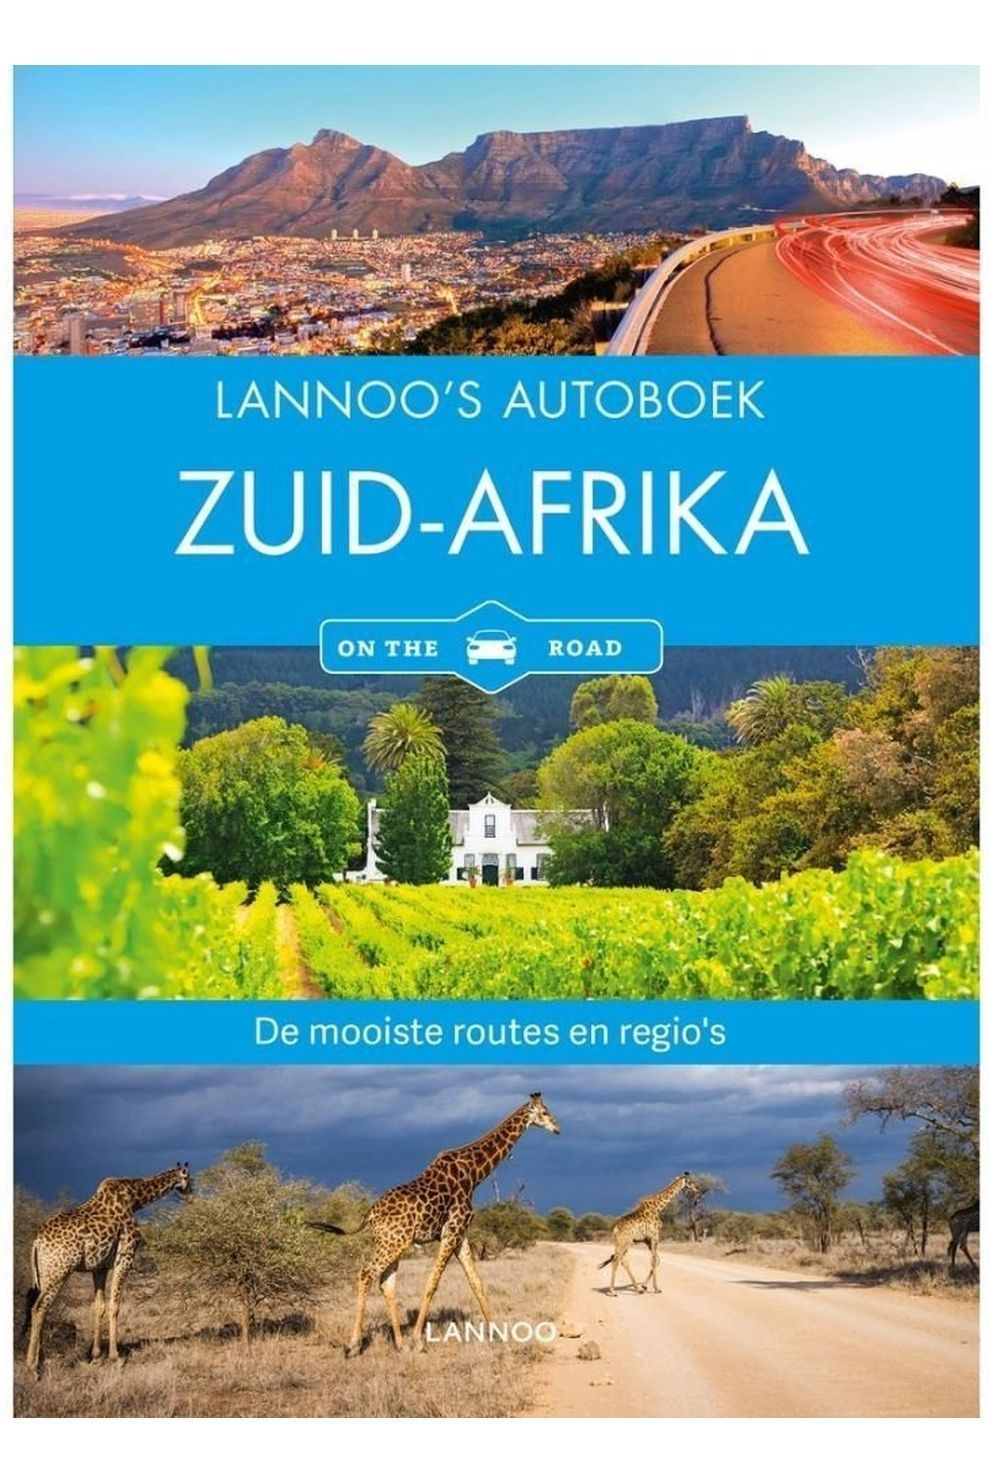 Lannoo Zuid-Afrika-Autoboek-On The Road-N09/2019 - 2019